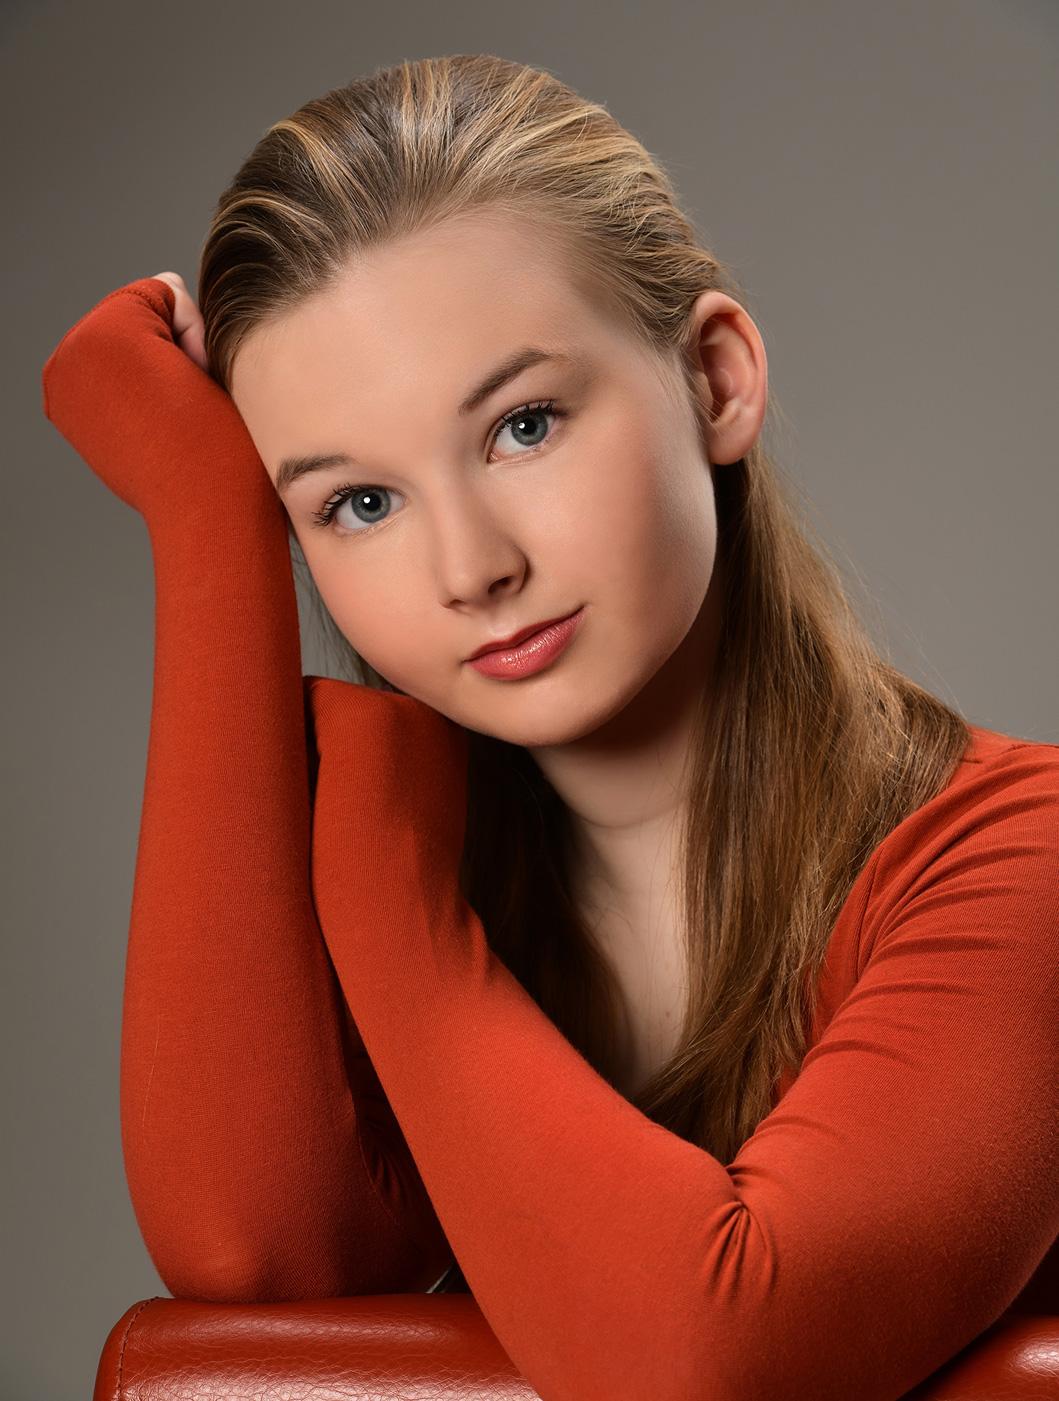 headshot of a teenage girl